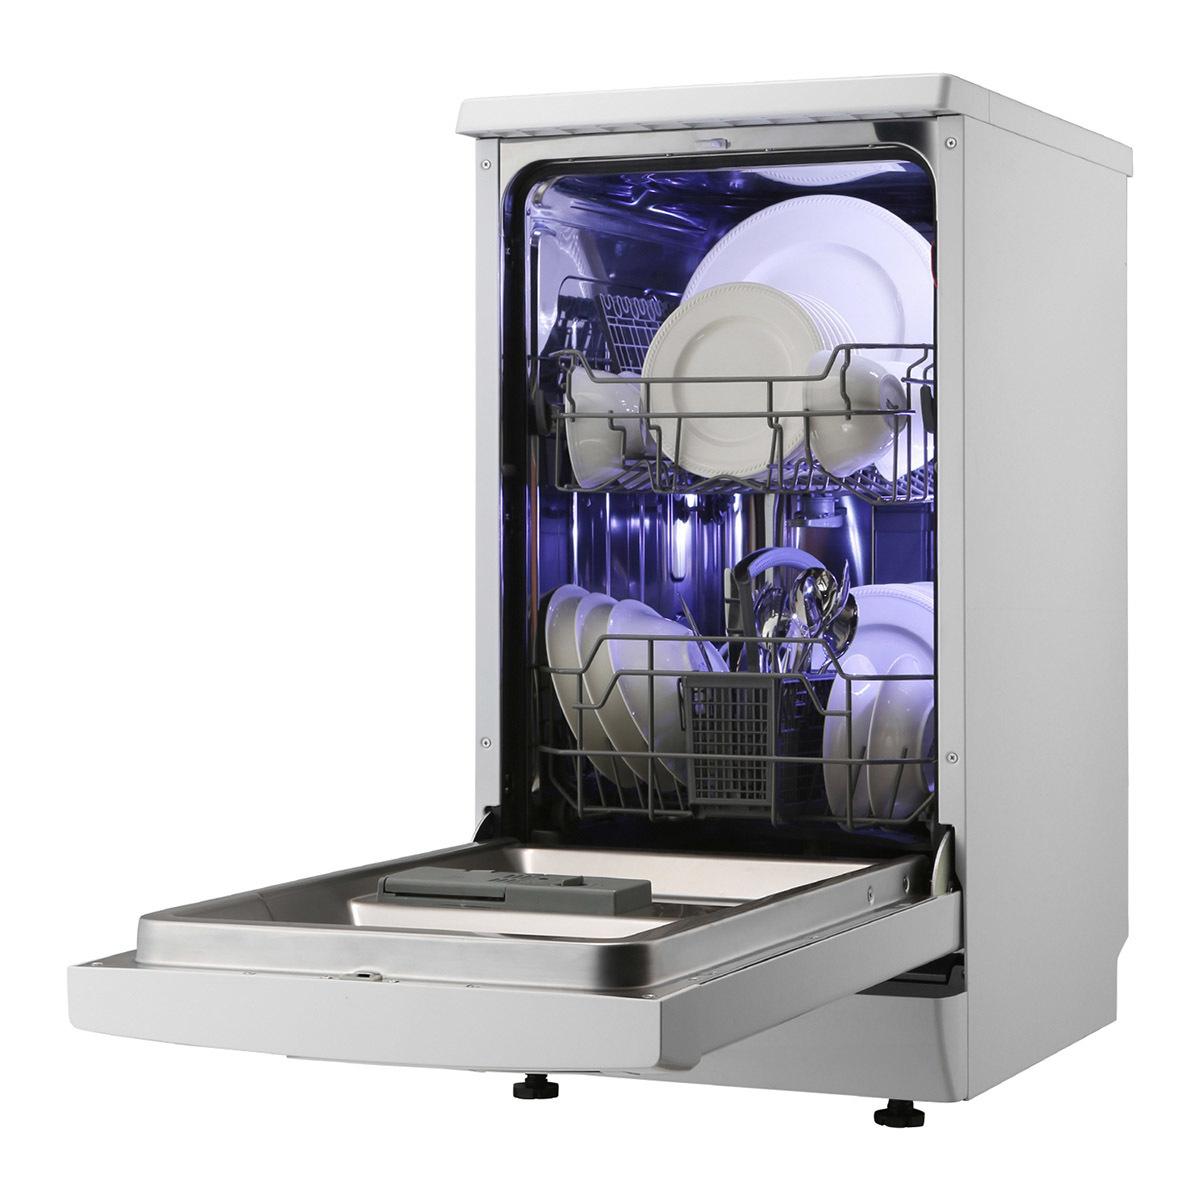 SK 매직 슬림 식기세척기 (8인용) Magic Slim Dishwasher, 단일상품